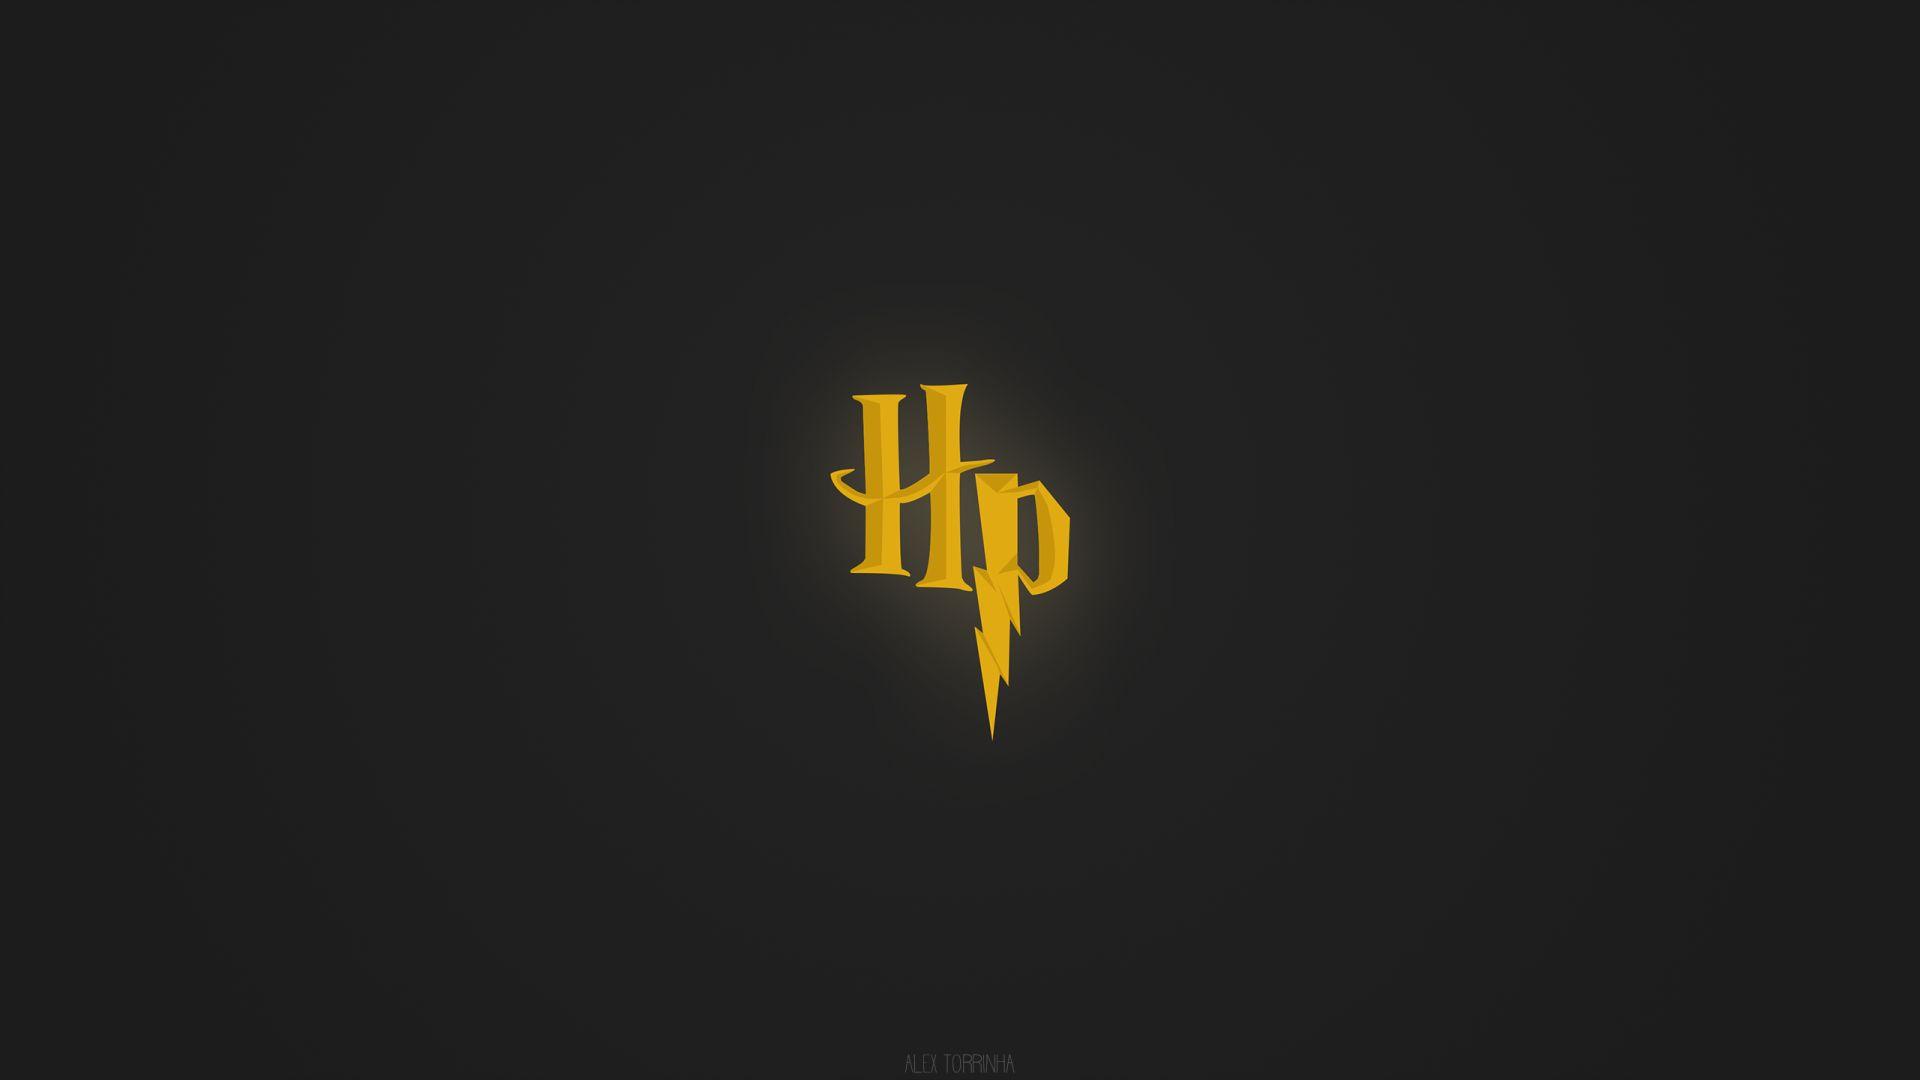 Harry Potter Full HD Wallpaper